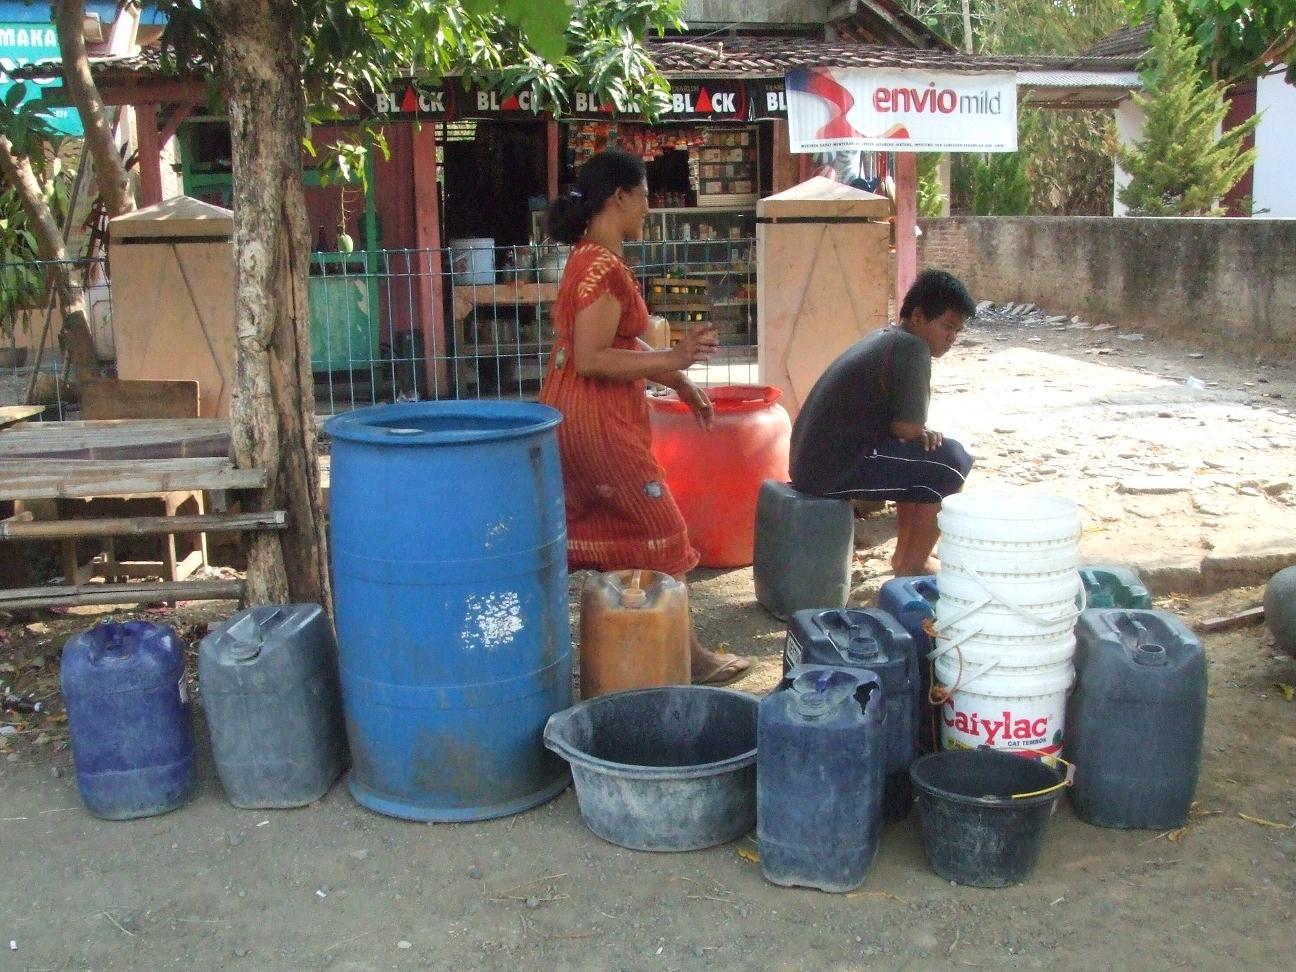 TUNGGU AIR:Warga Dusun Grabagan dan Brakbunder, Desa Katelan, Kecamatan Tangen,Sragen menunggu bantuan air di tepi jalan desa setempat